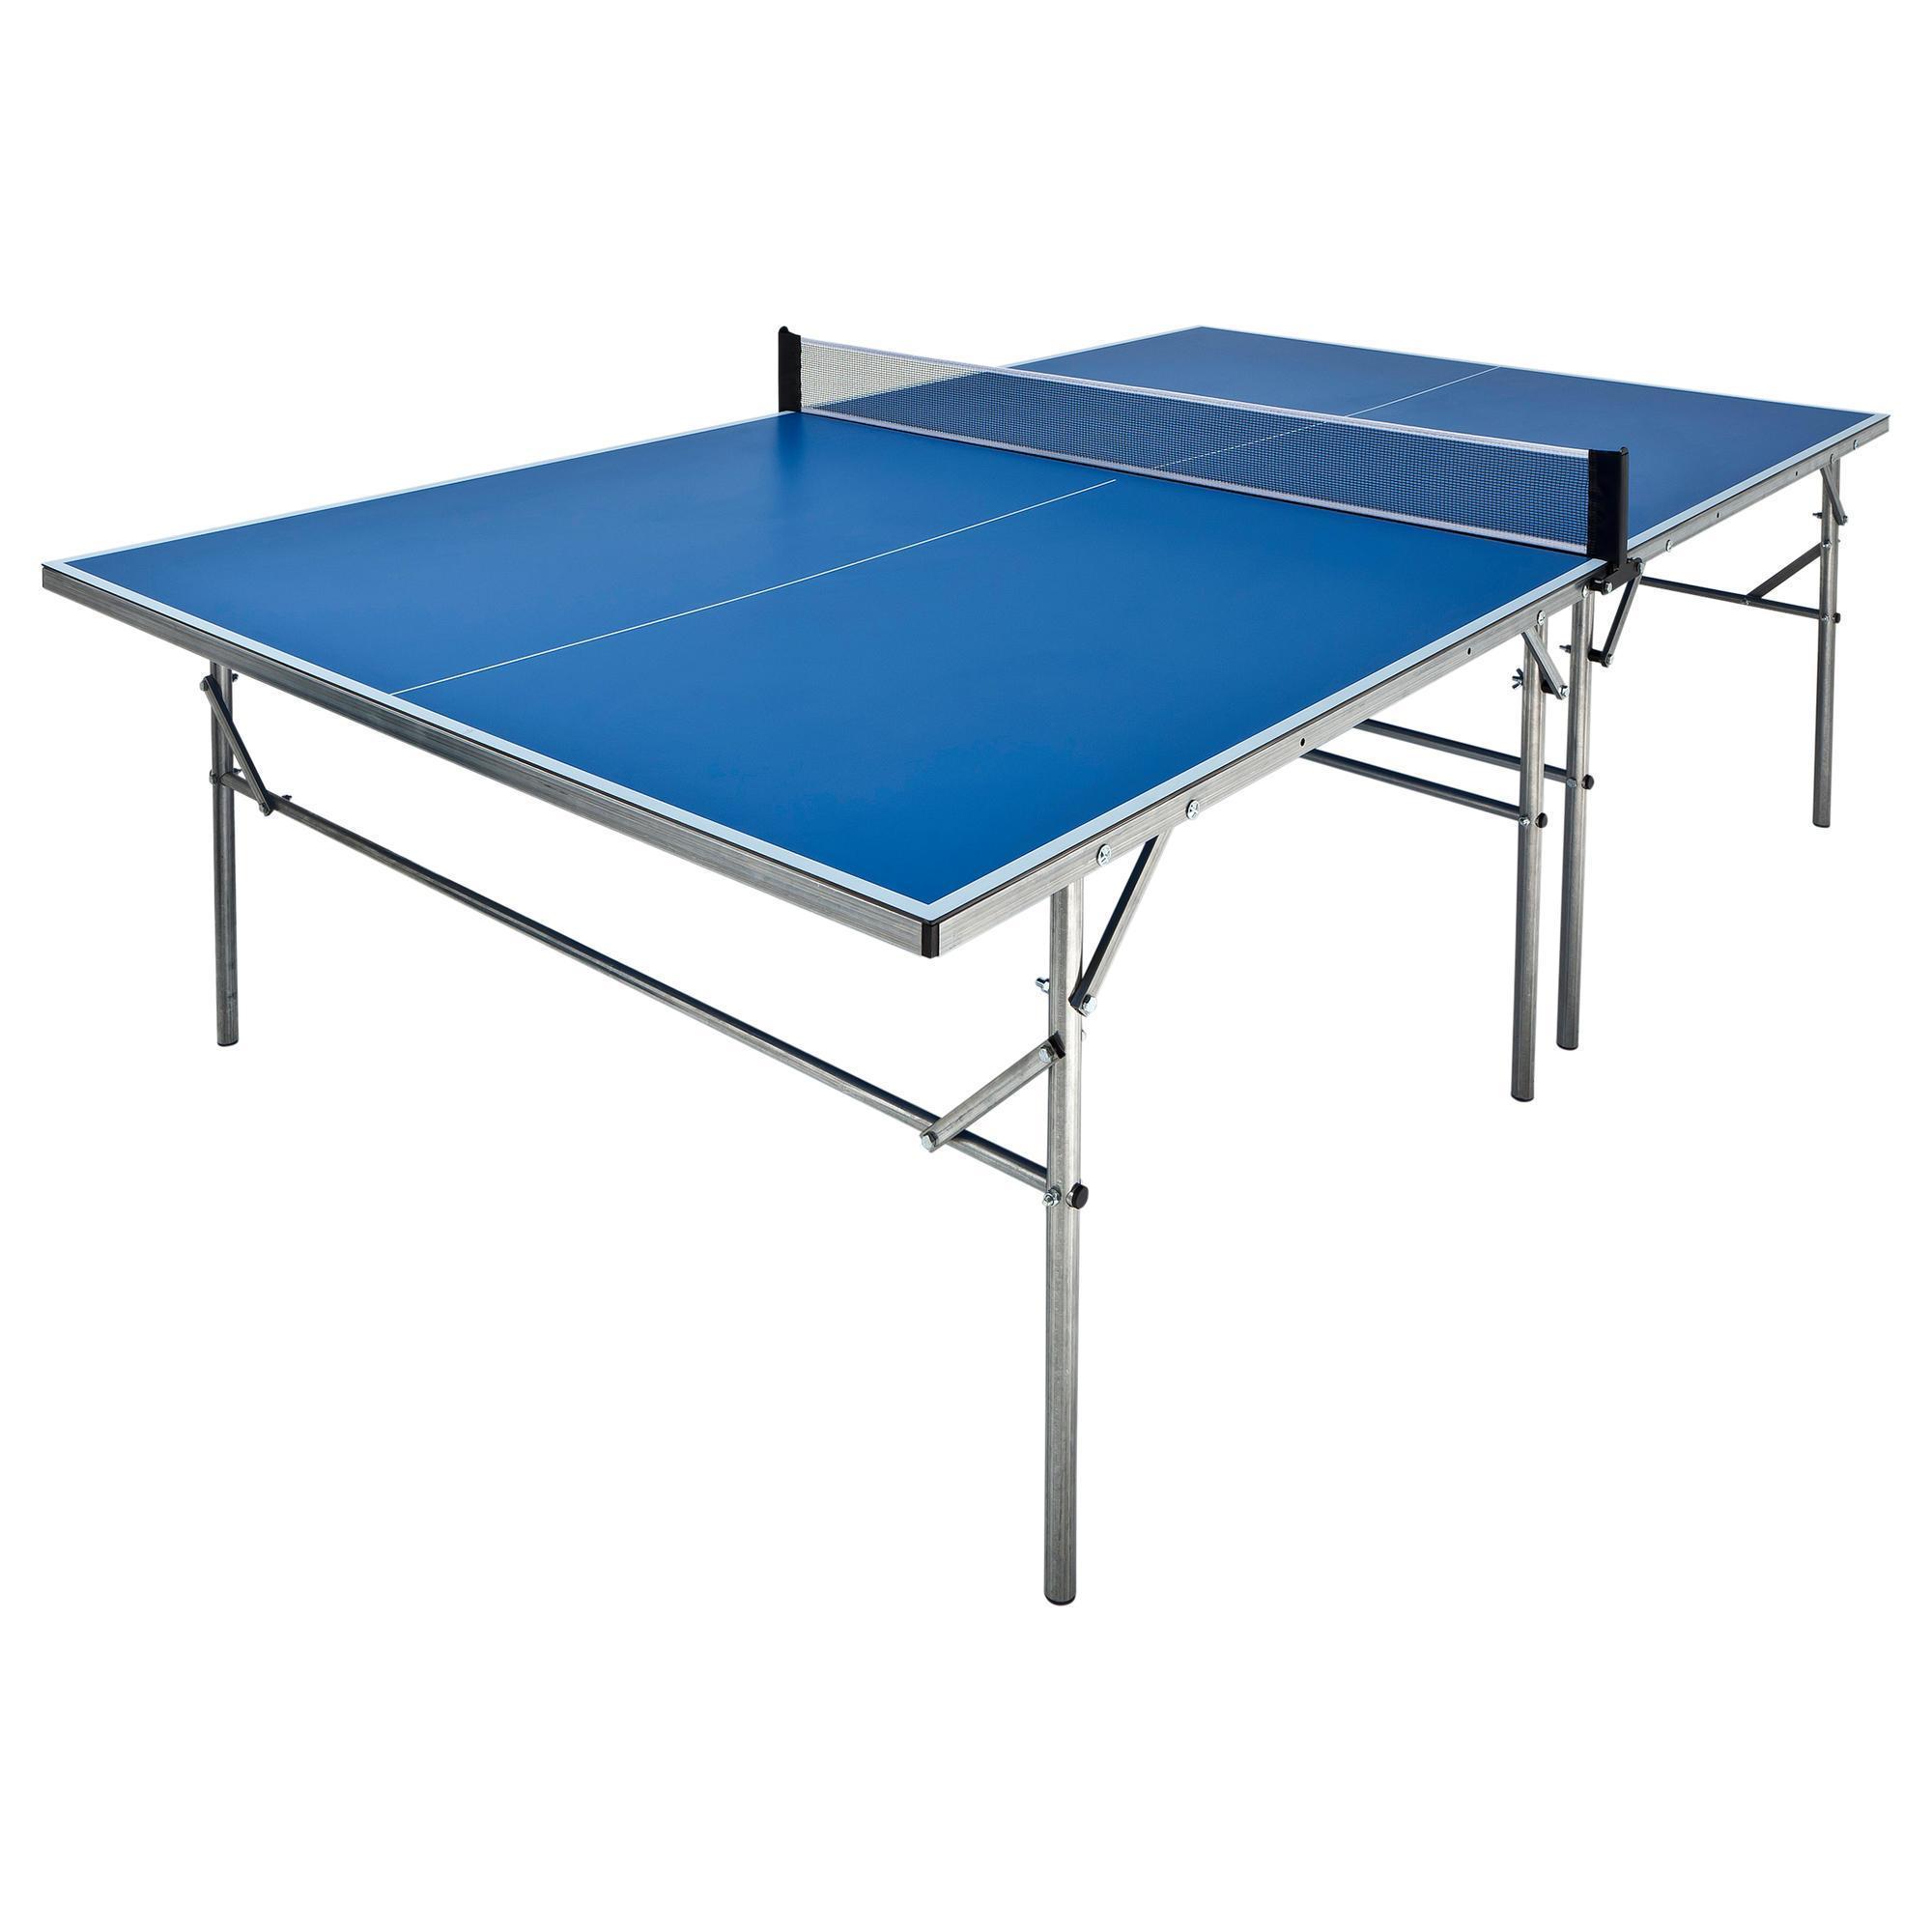 695305f90 Mesa De Ping Pong Free Ppt 130 Ft 720 Outdoor Artengo